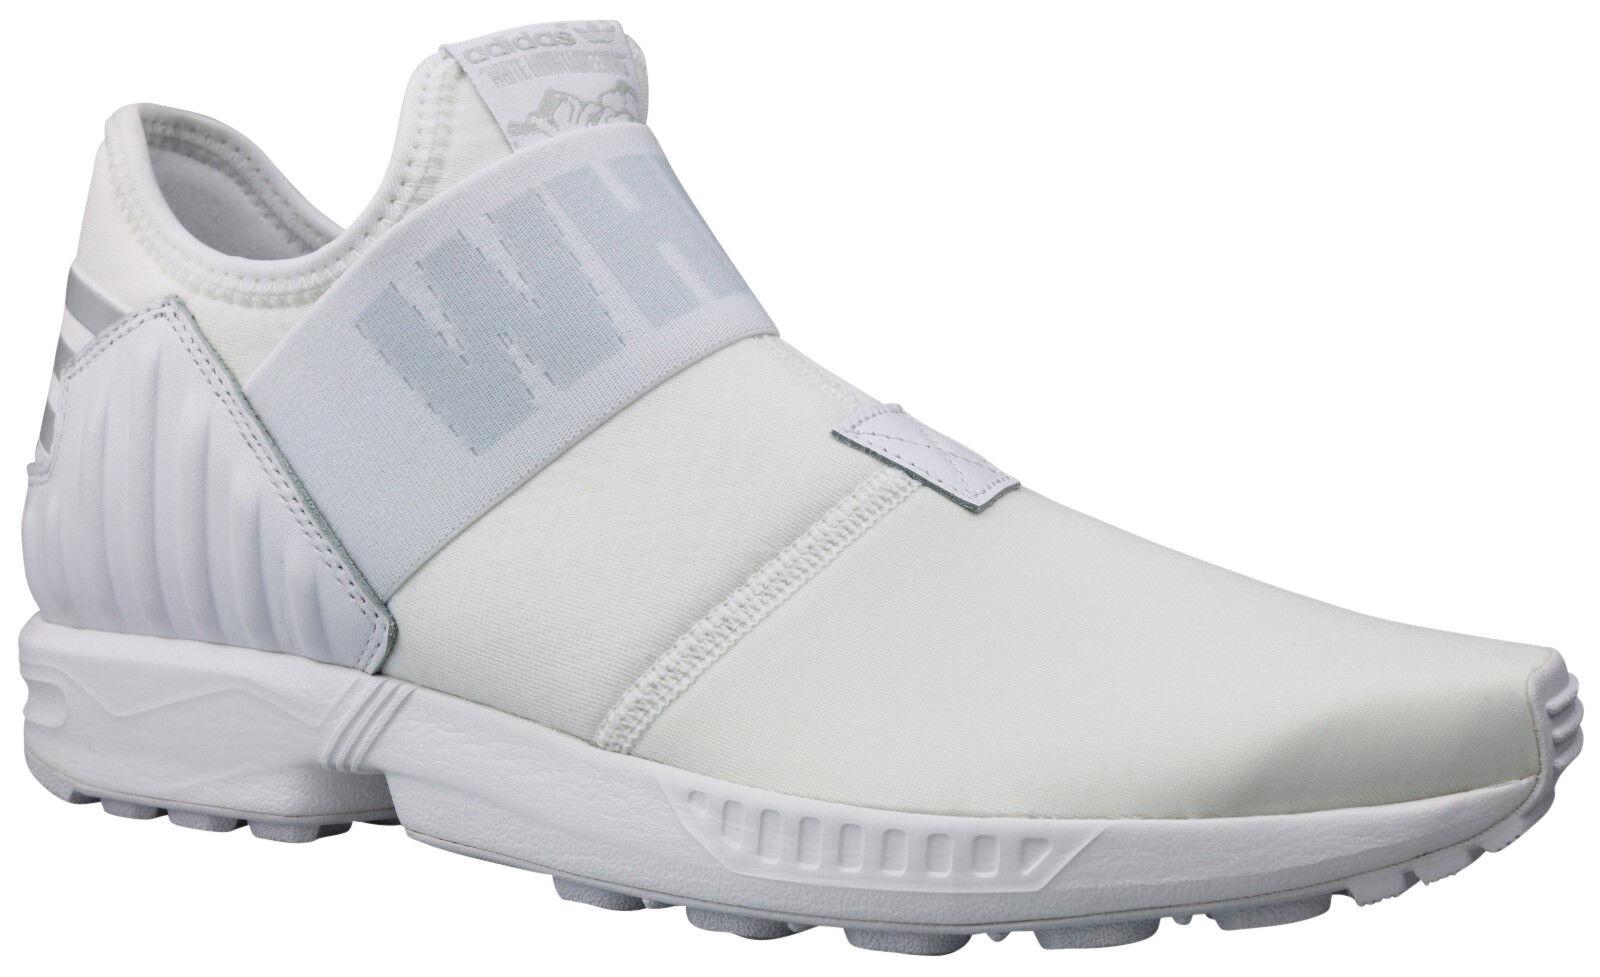 Adidas x Weiß Mountaineering ZX Flux Plus Turnschuhe Schuhe weiß Gr. 40 - 44 NEU